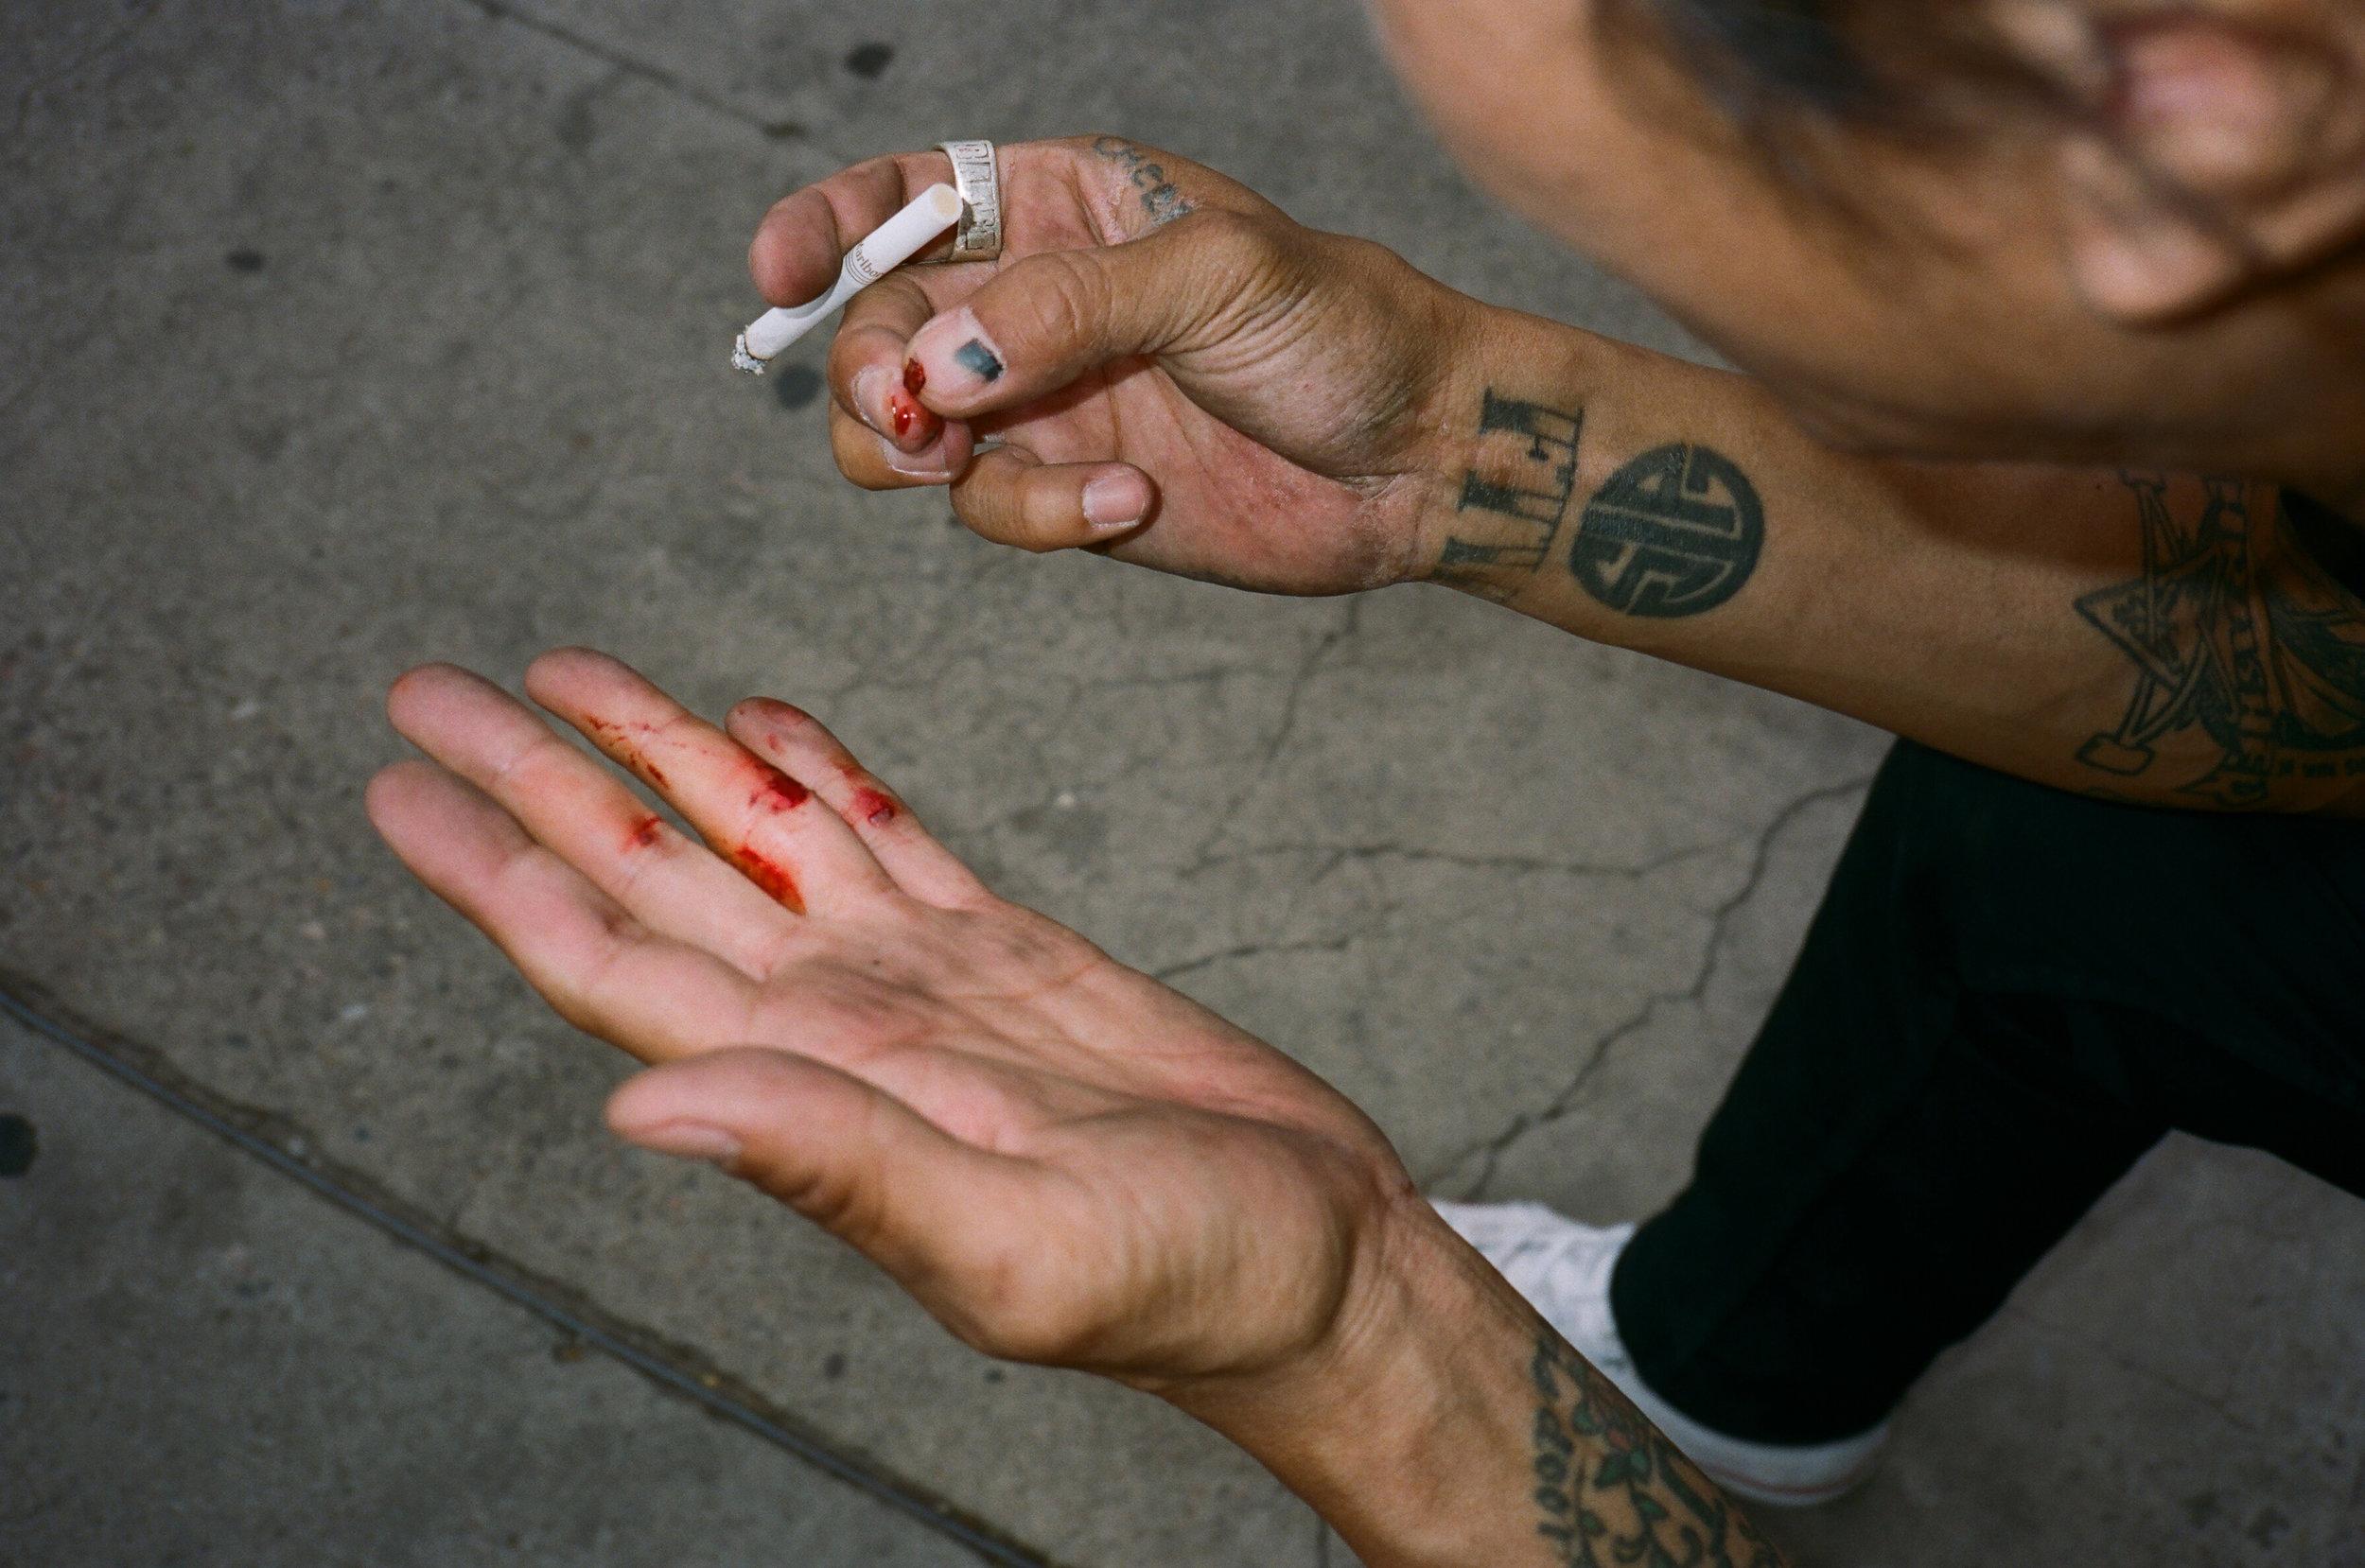 nuge_hands_quintero.jpg